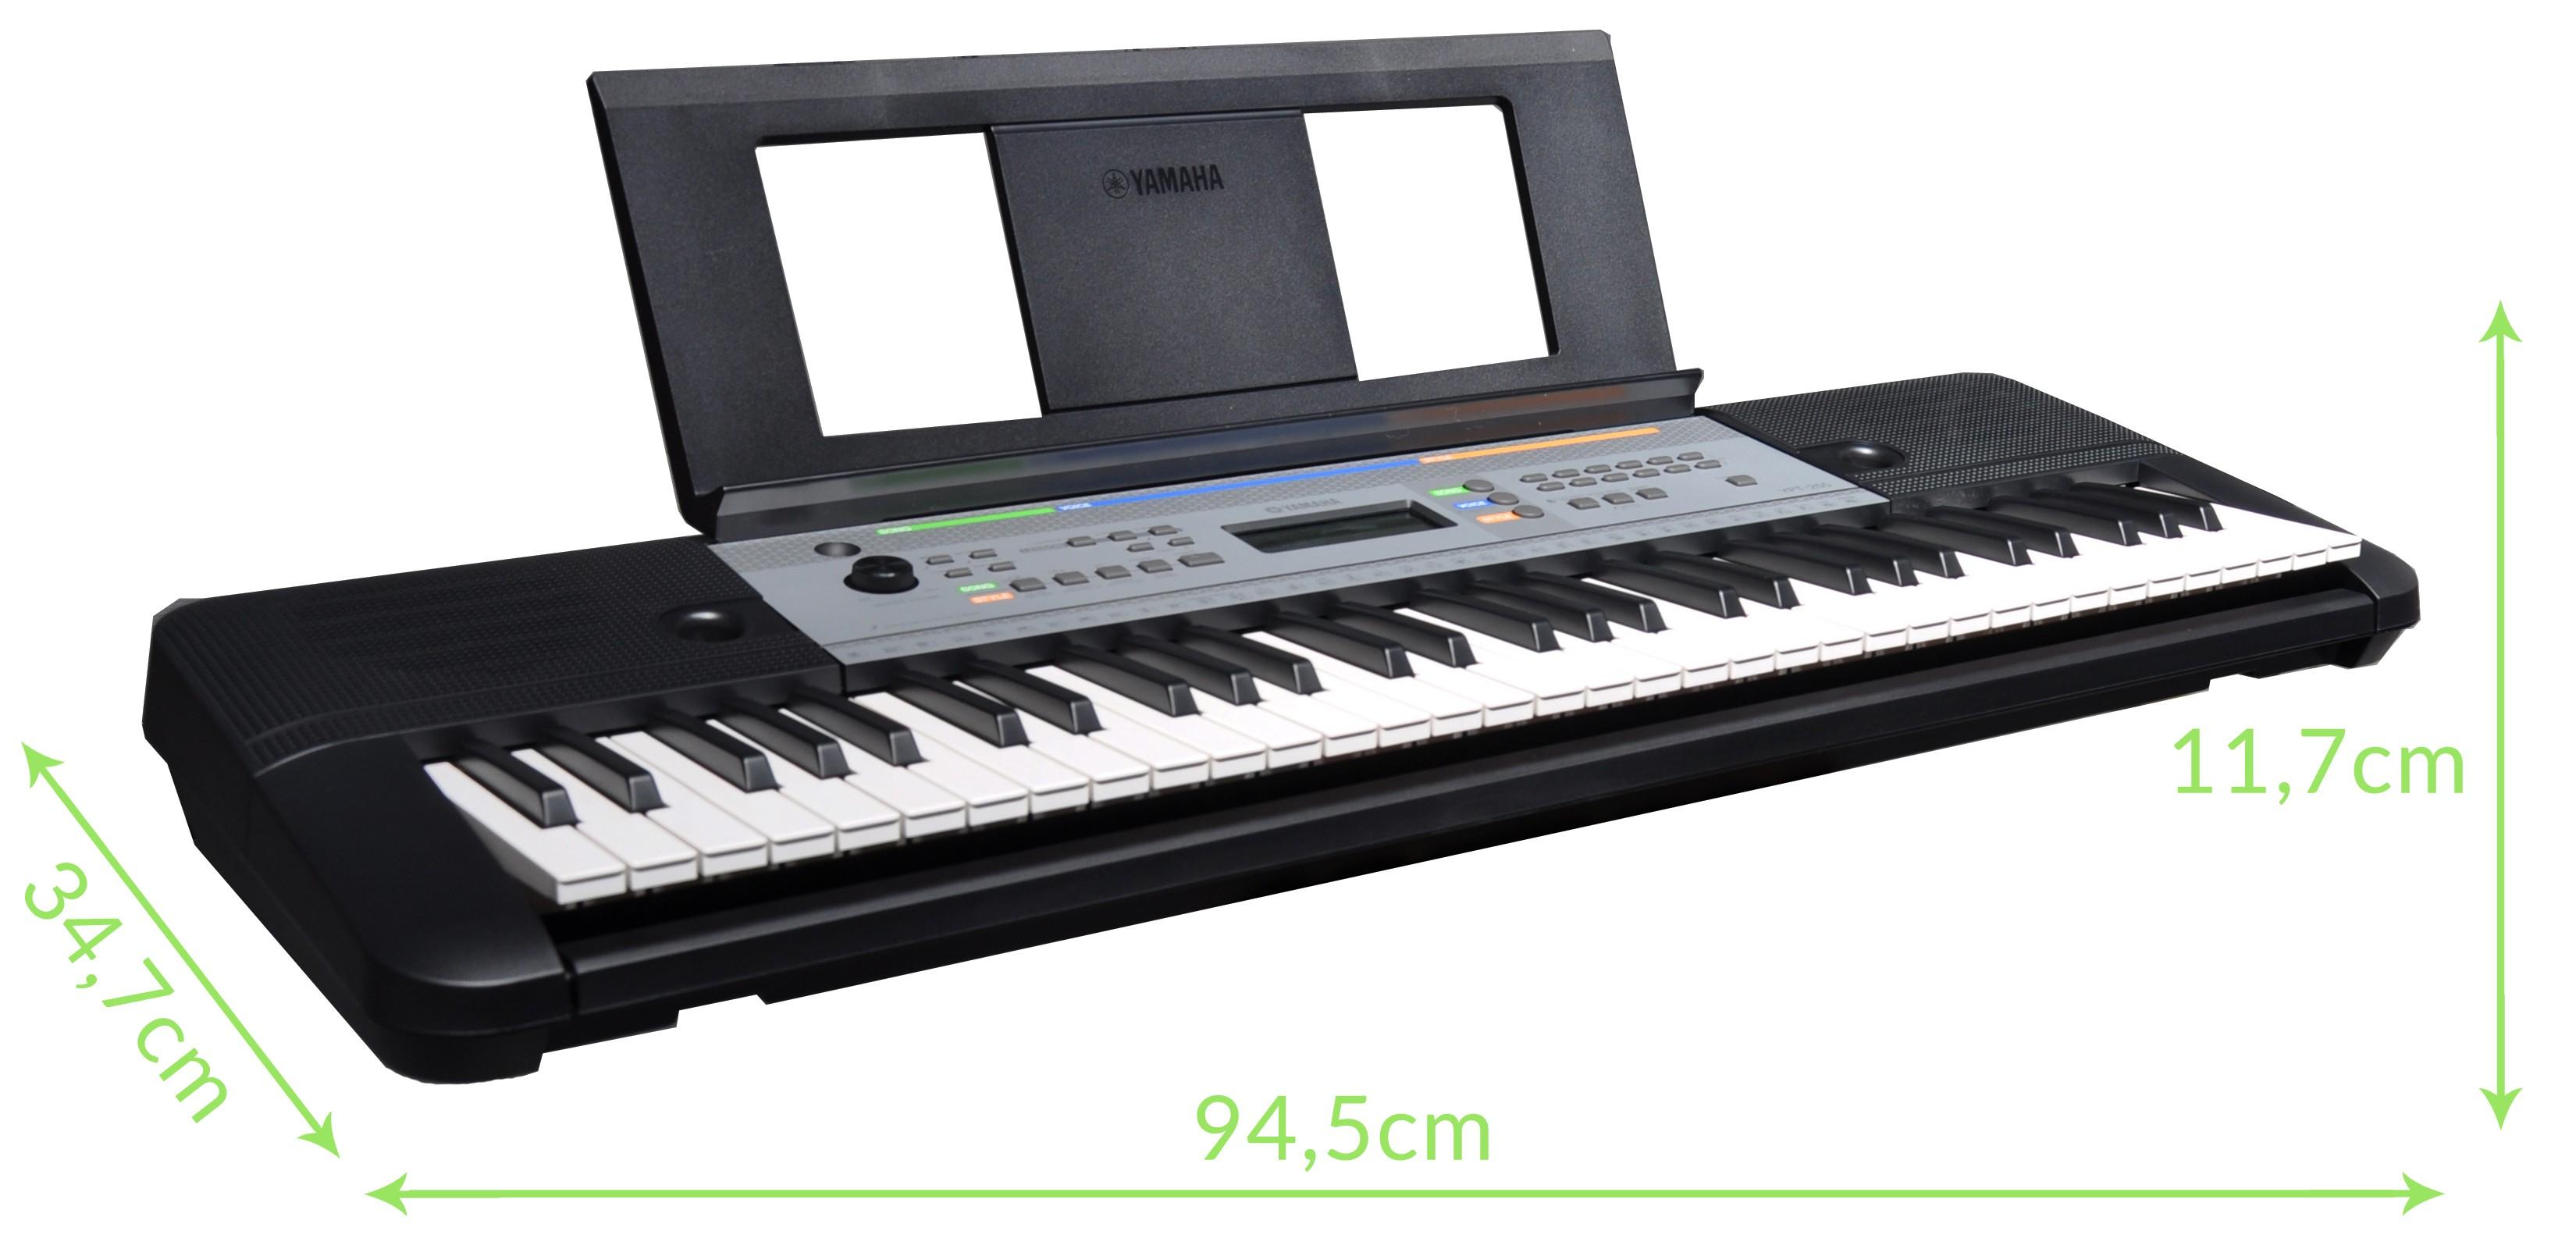 yamaha_ypt_255_keyboard_organ_10.jpg